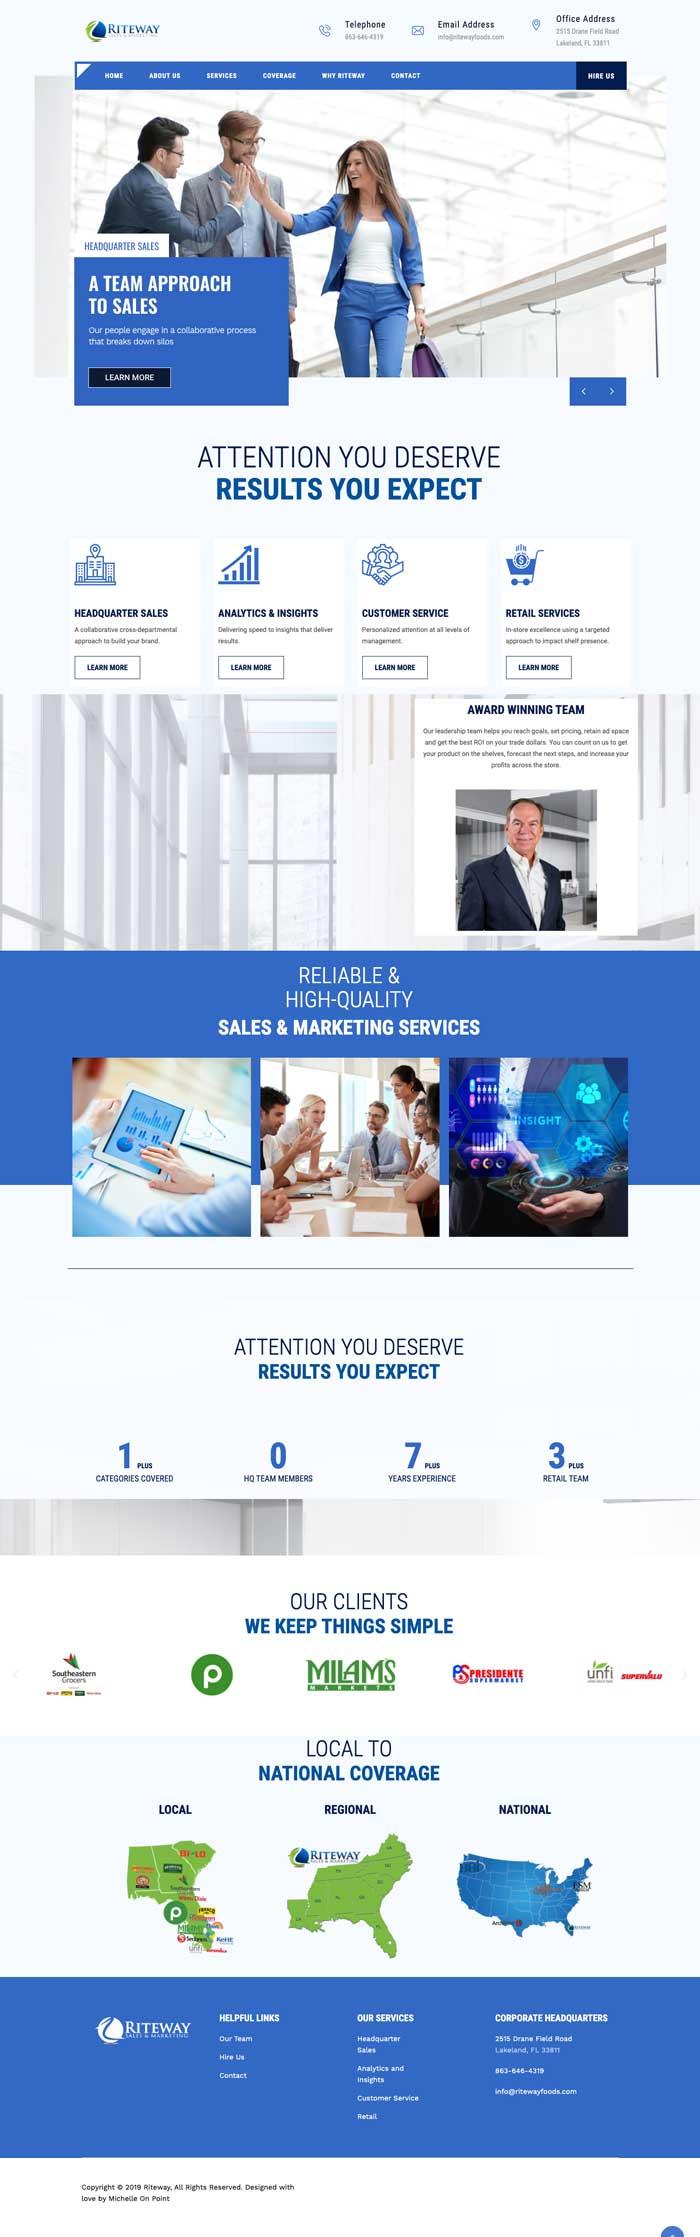 Riteway Sales & Marketing Website